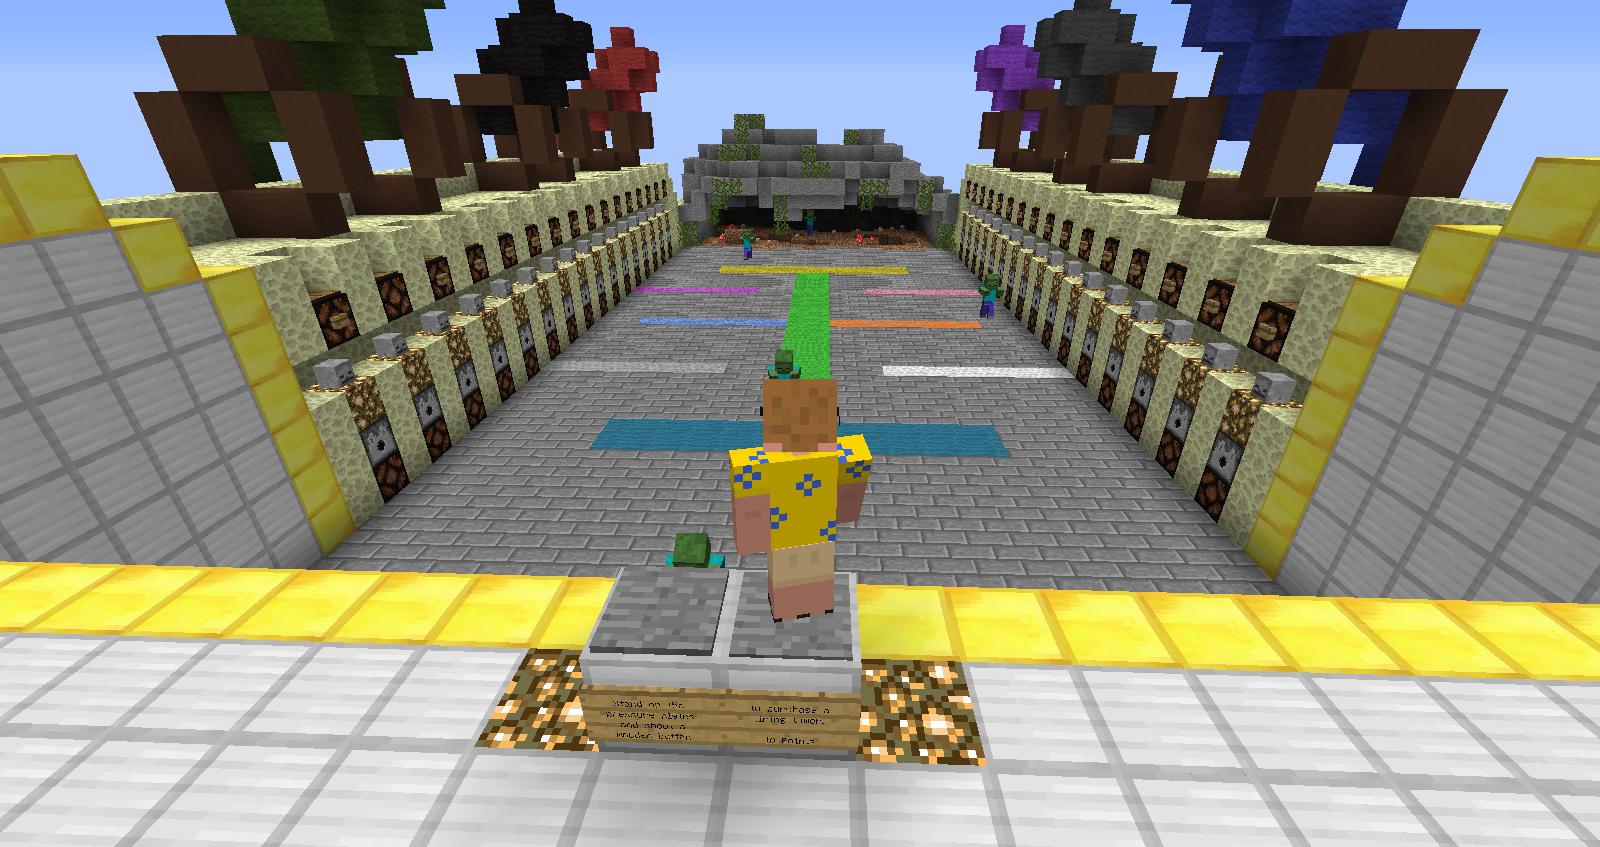 Maps] Minecraft Blocks vs Zombies Map 1.6.2